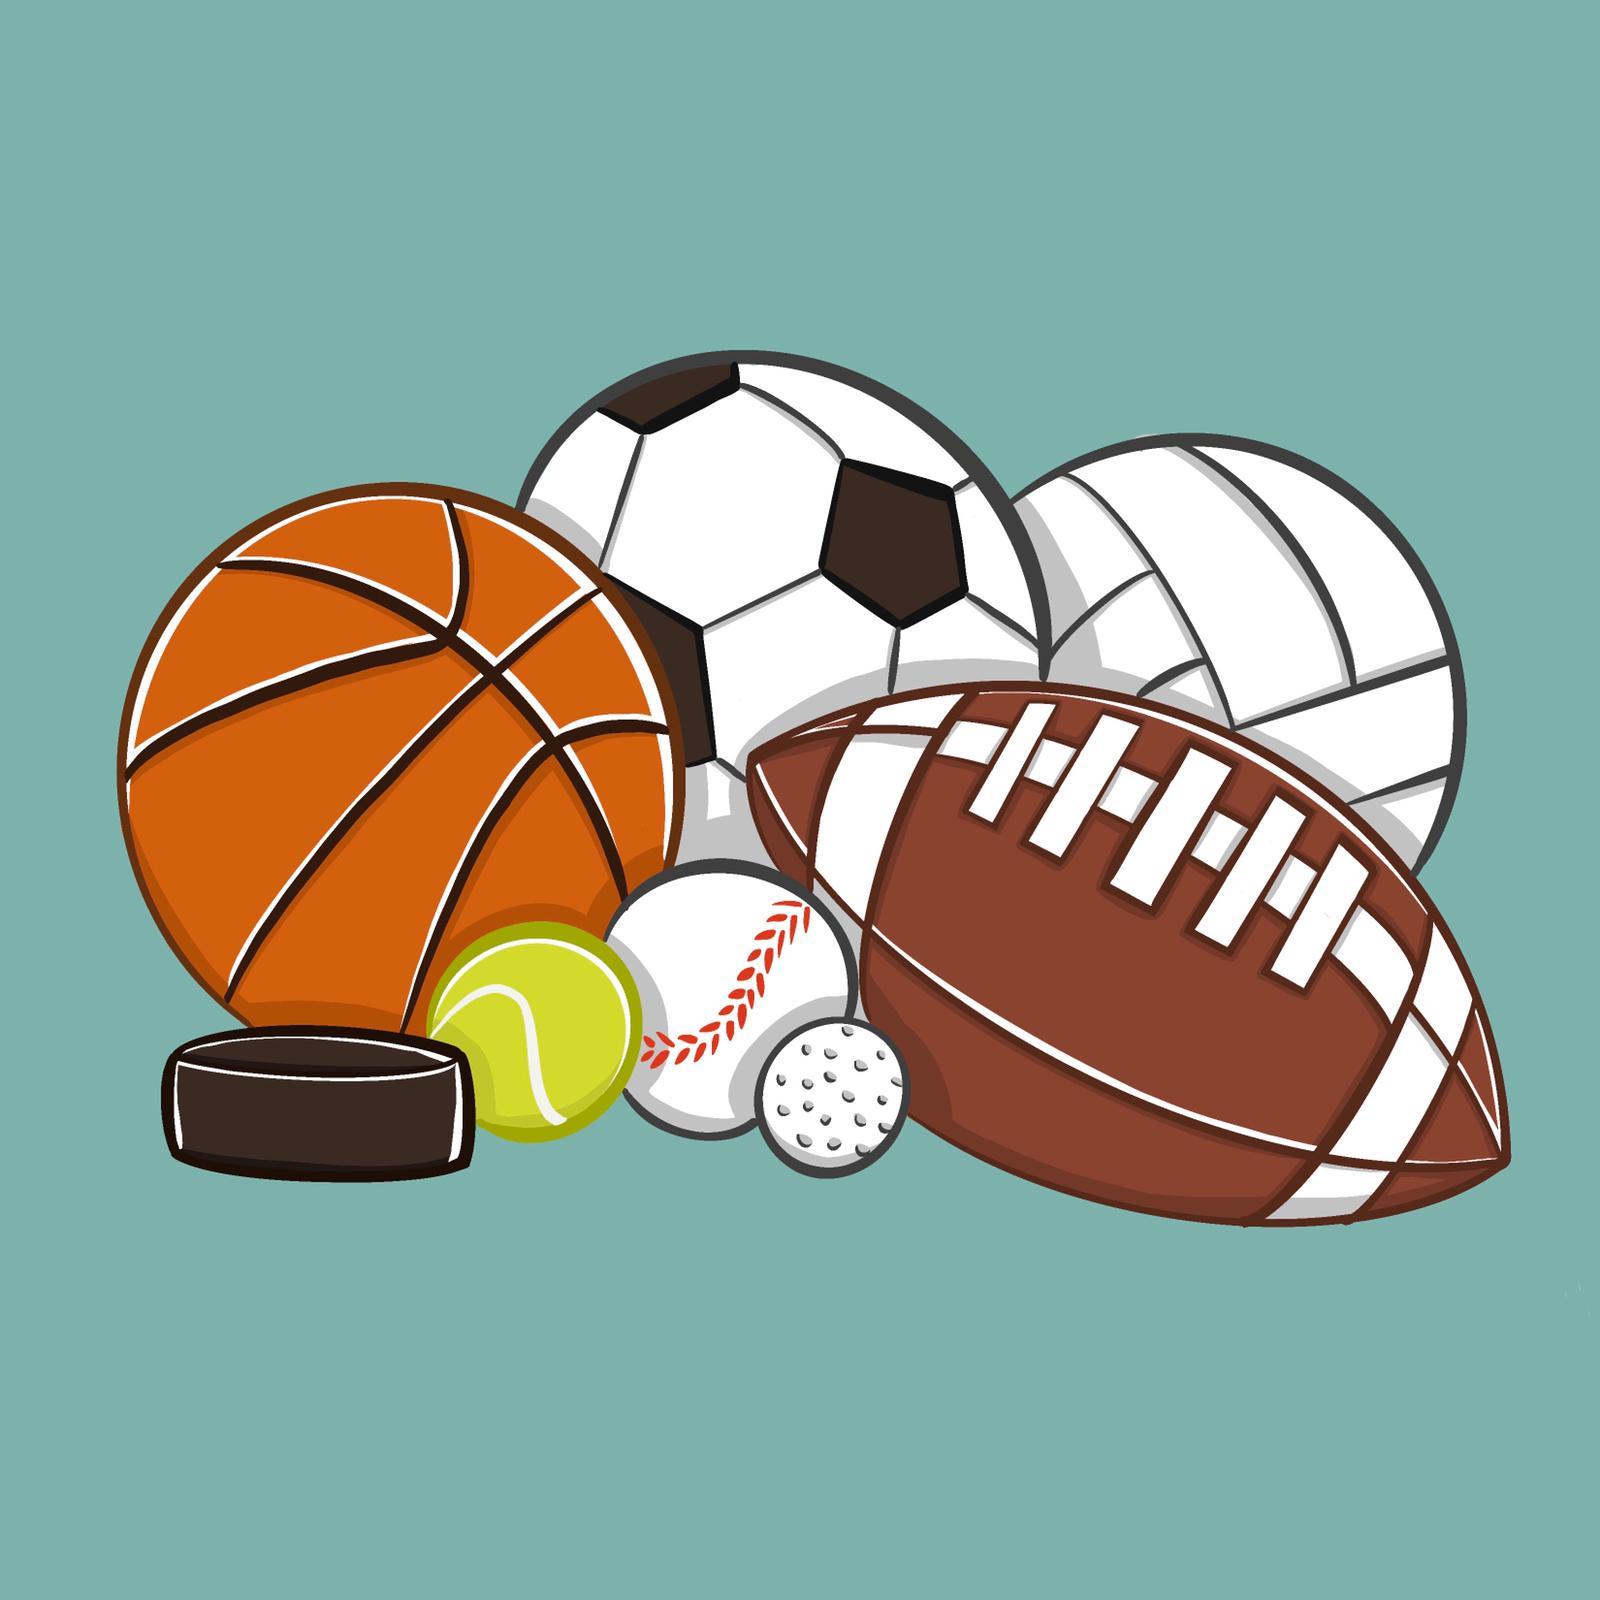 Allison Christensen illustrates a sports article for 360 MAGAZINE